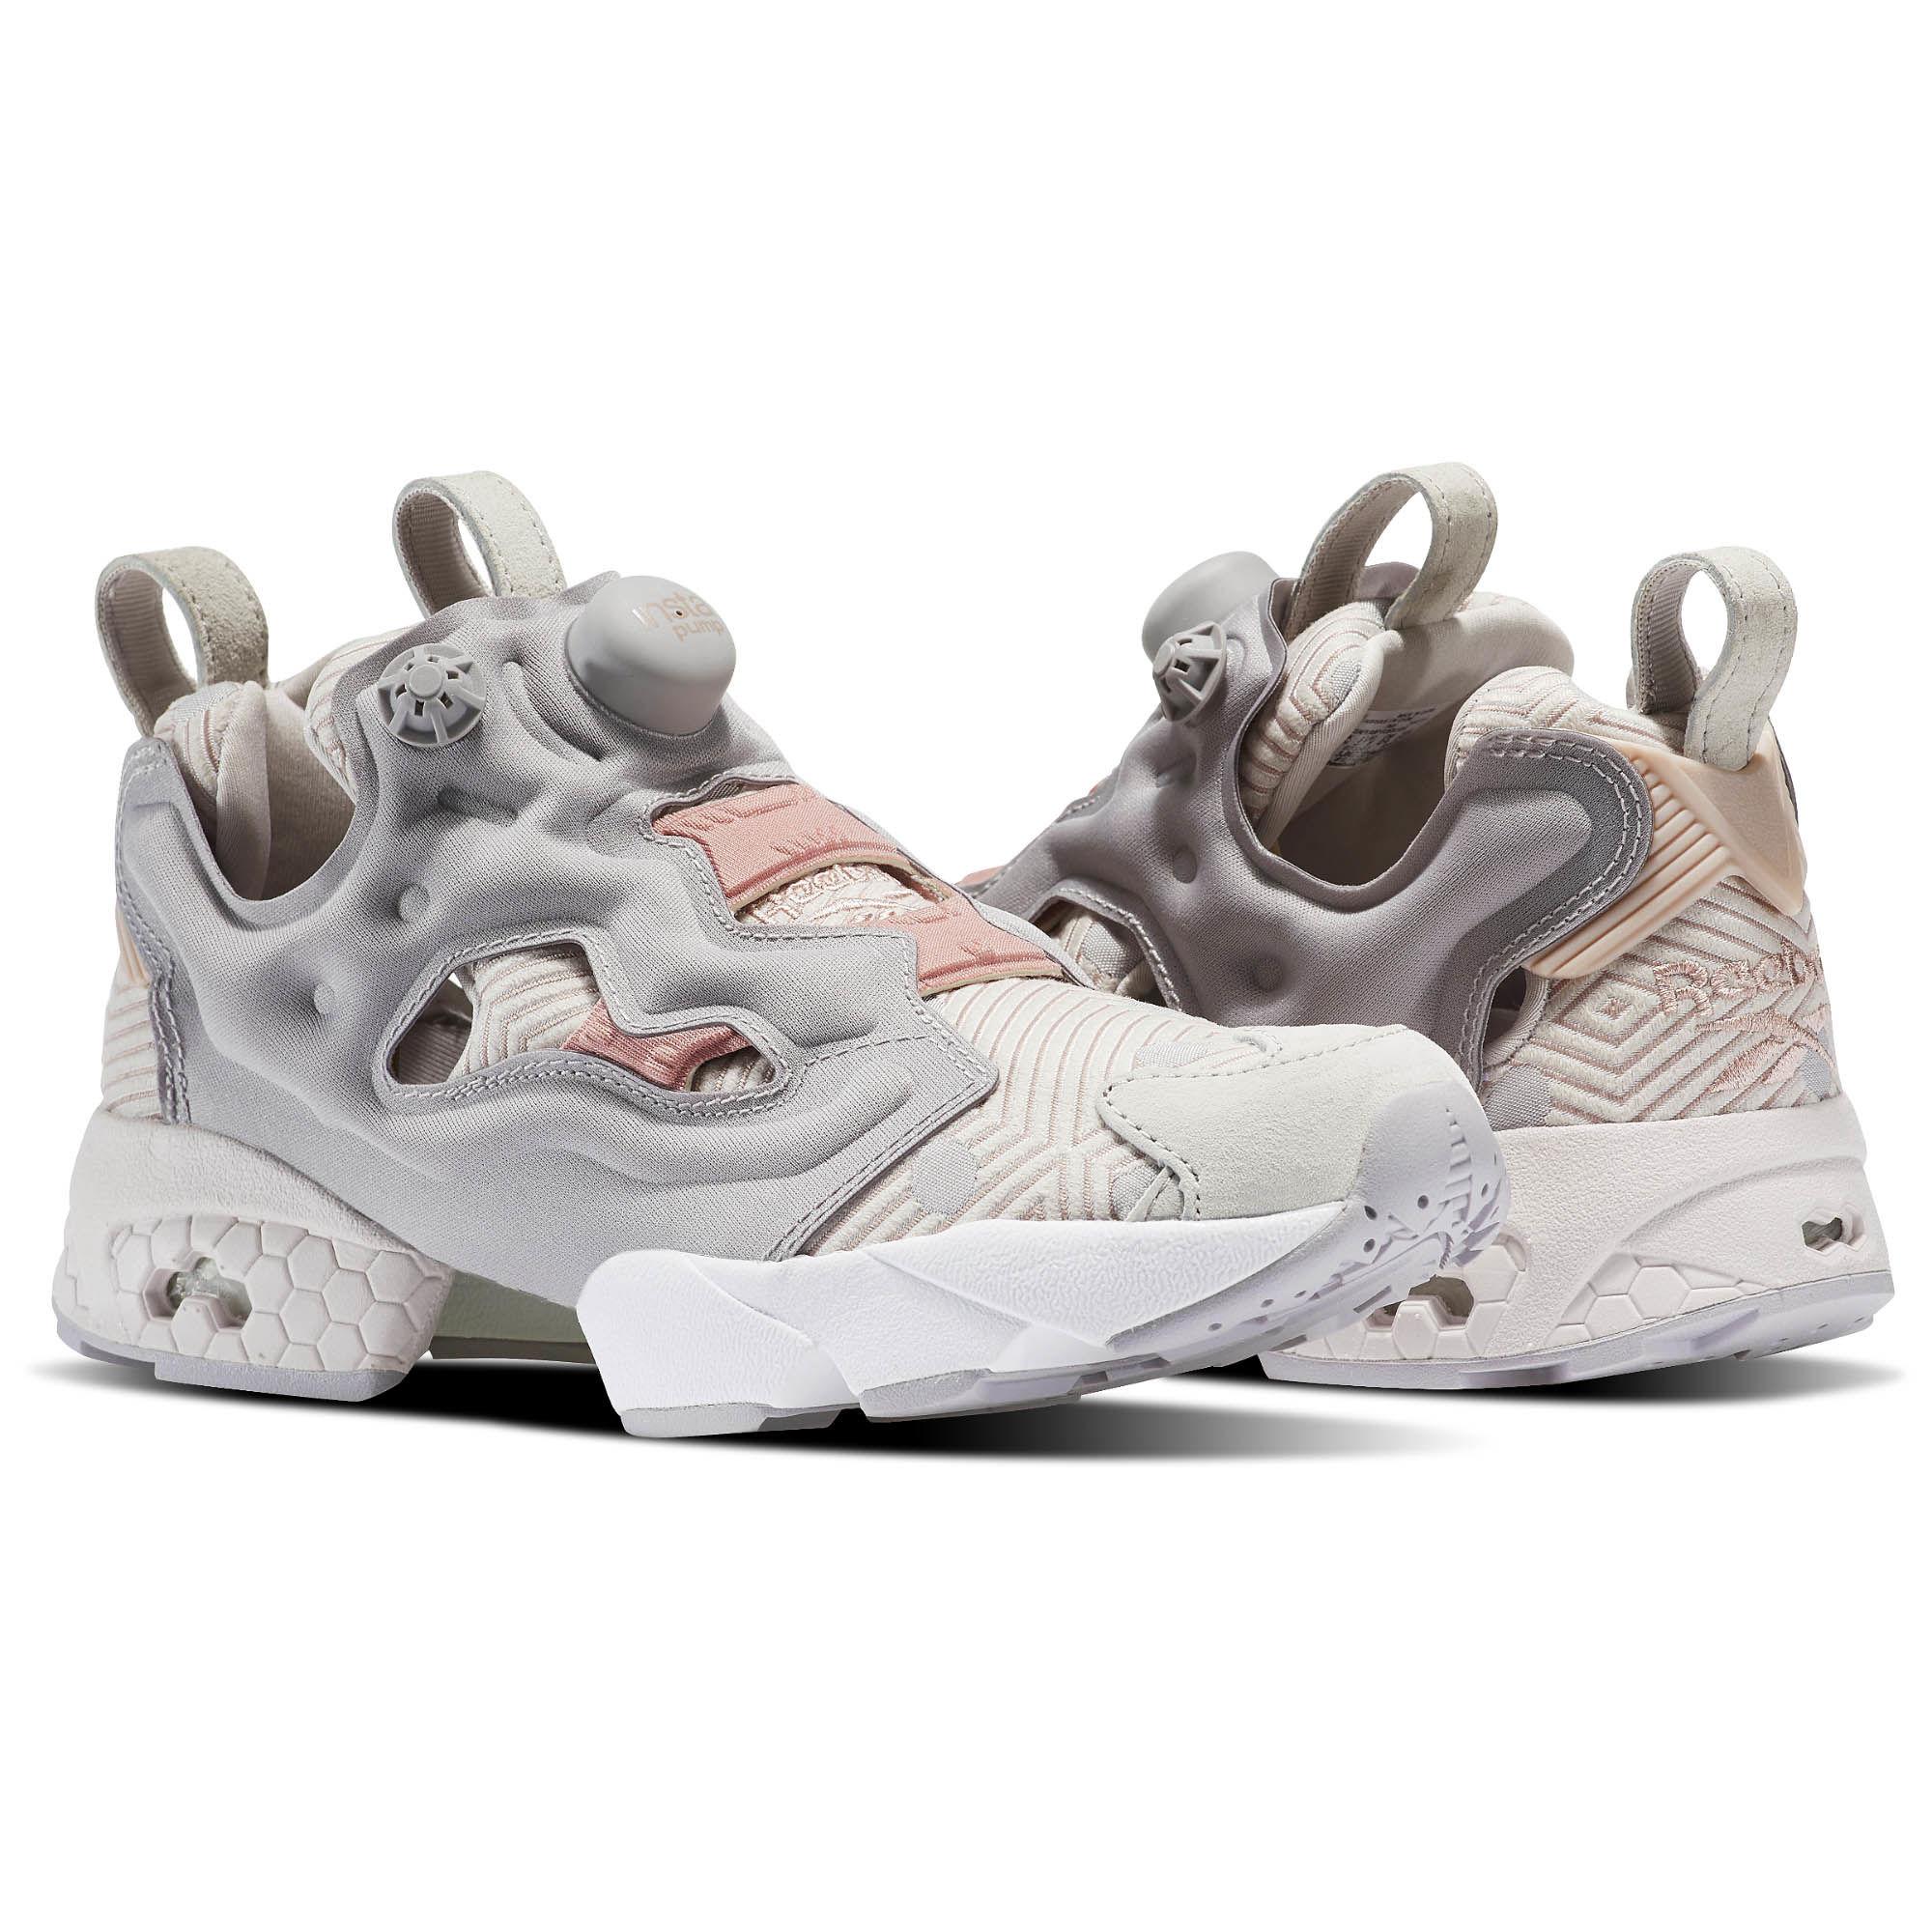 reebok insta pump womens reebok instapump fury fbt classics shoes white / beige / grey size KTMXTLC